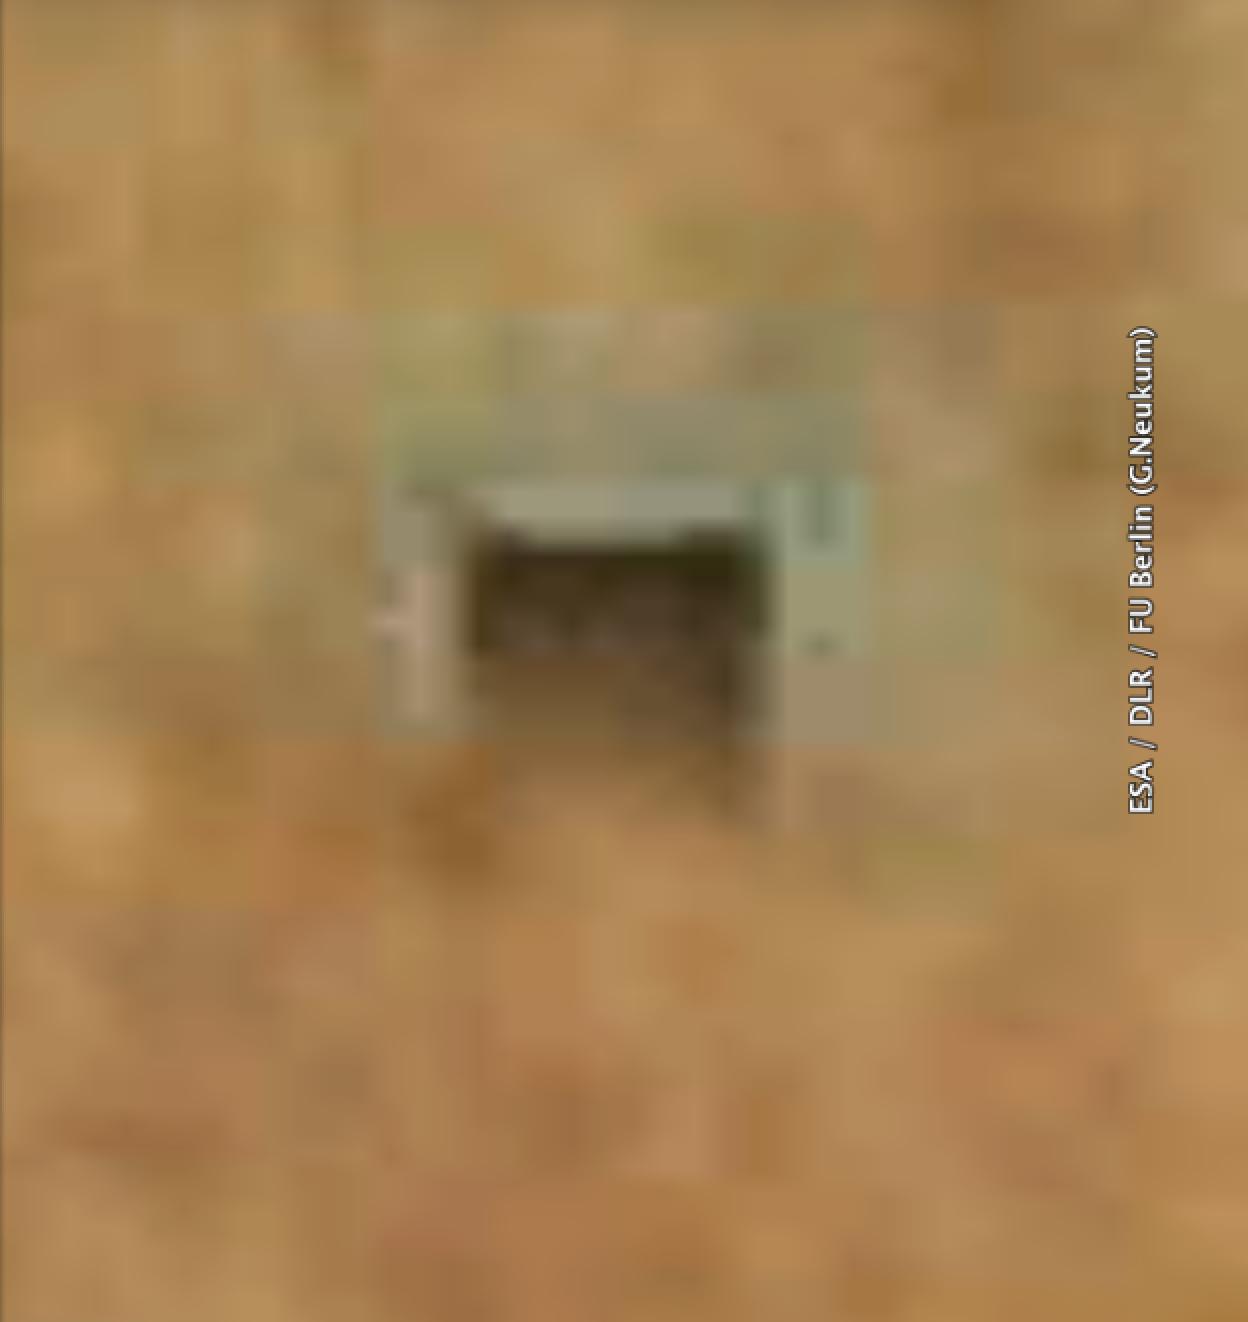 Stolleneingang auf dem Mars